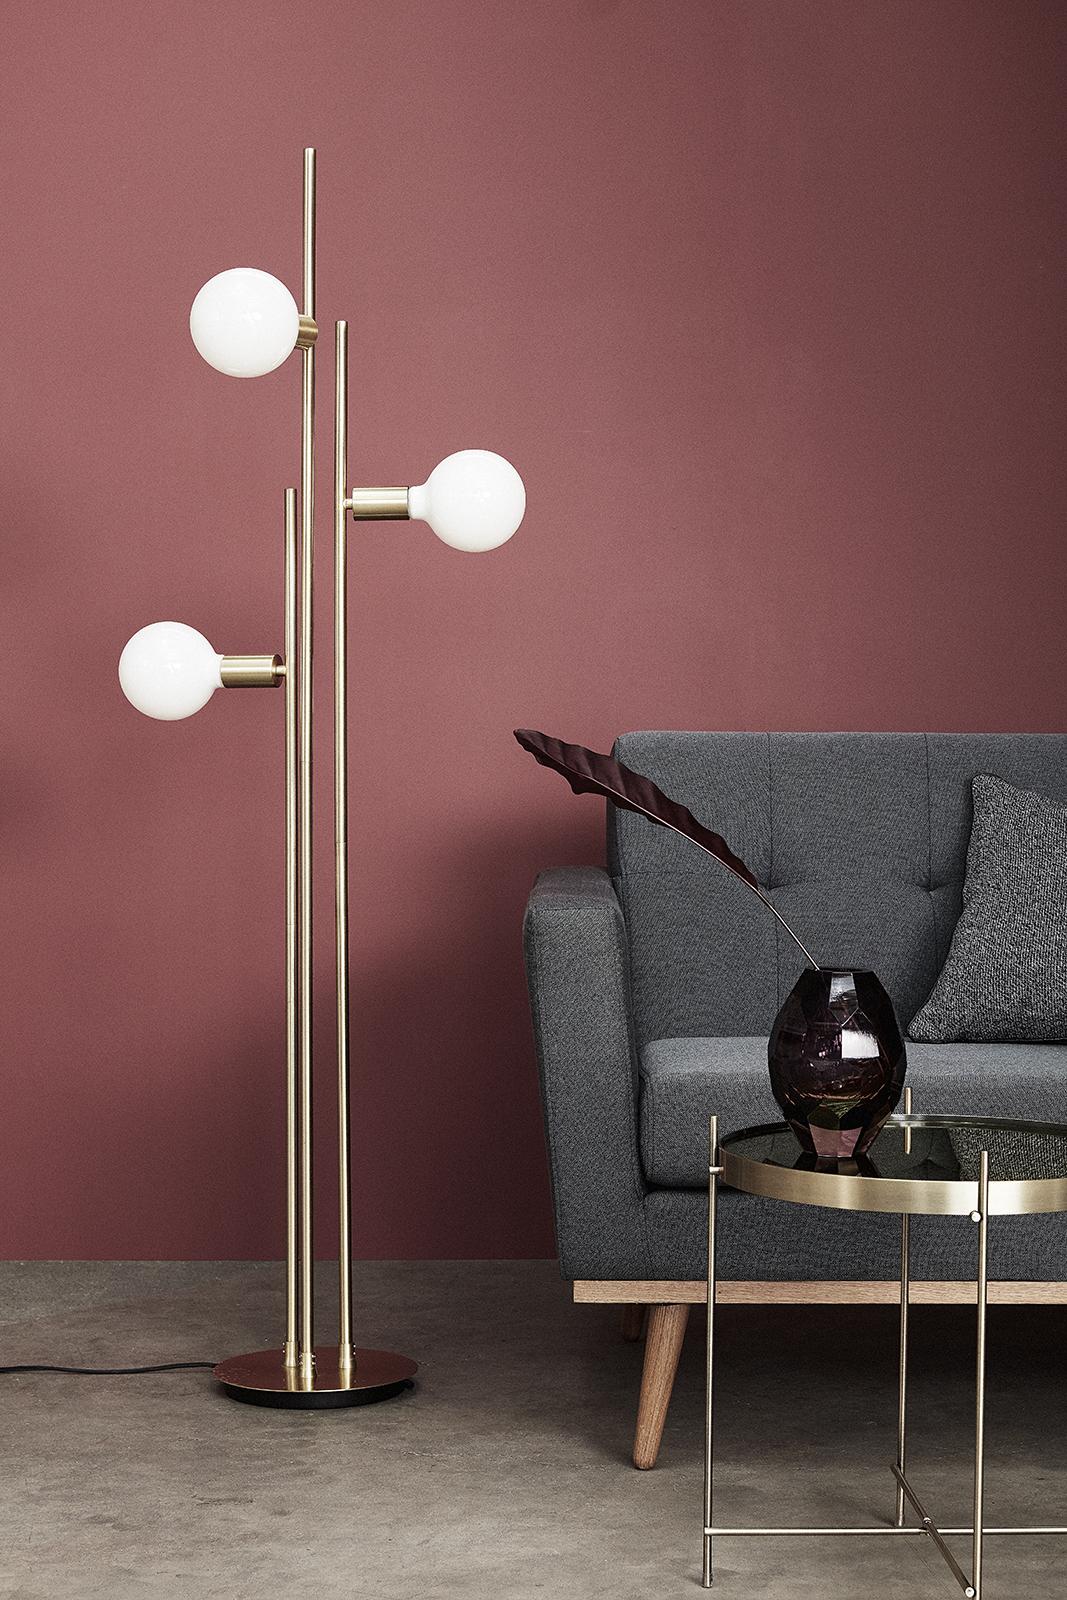 Напольная лампа с белыми плафонами